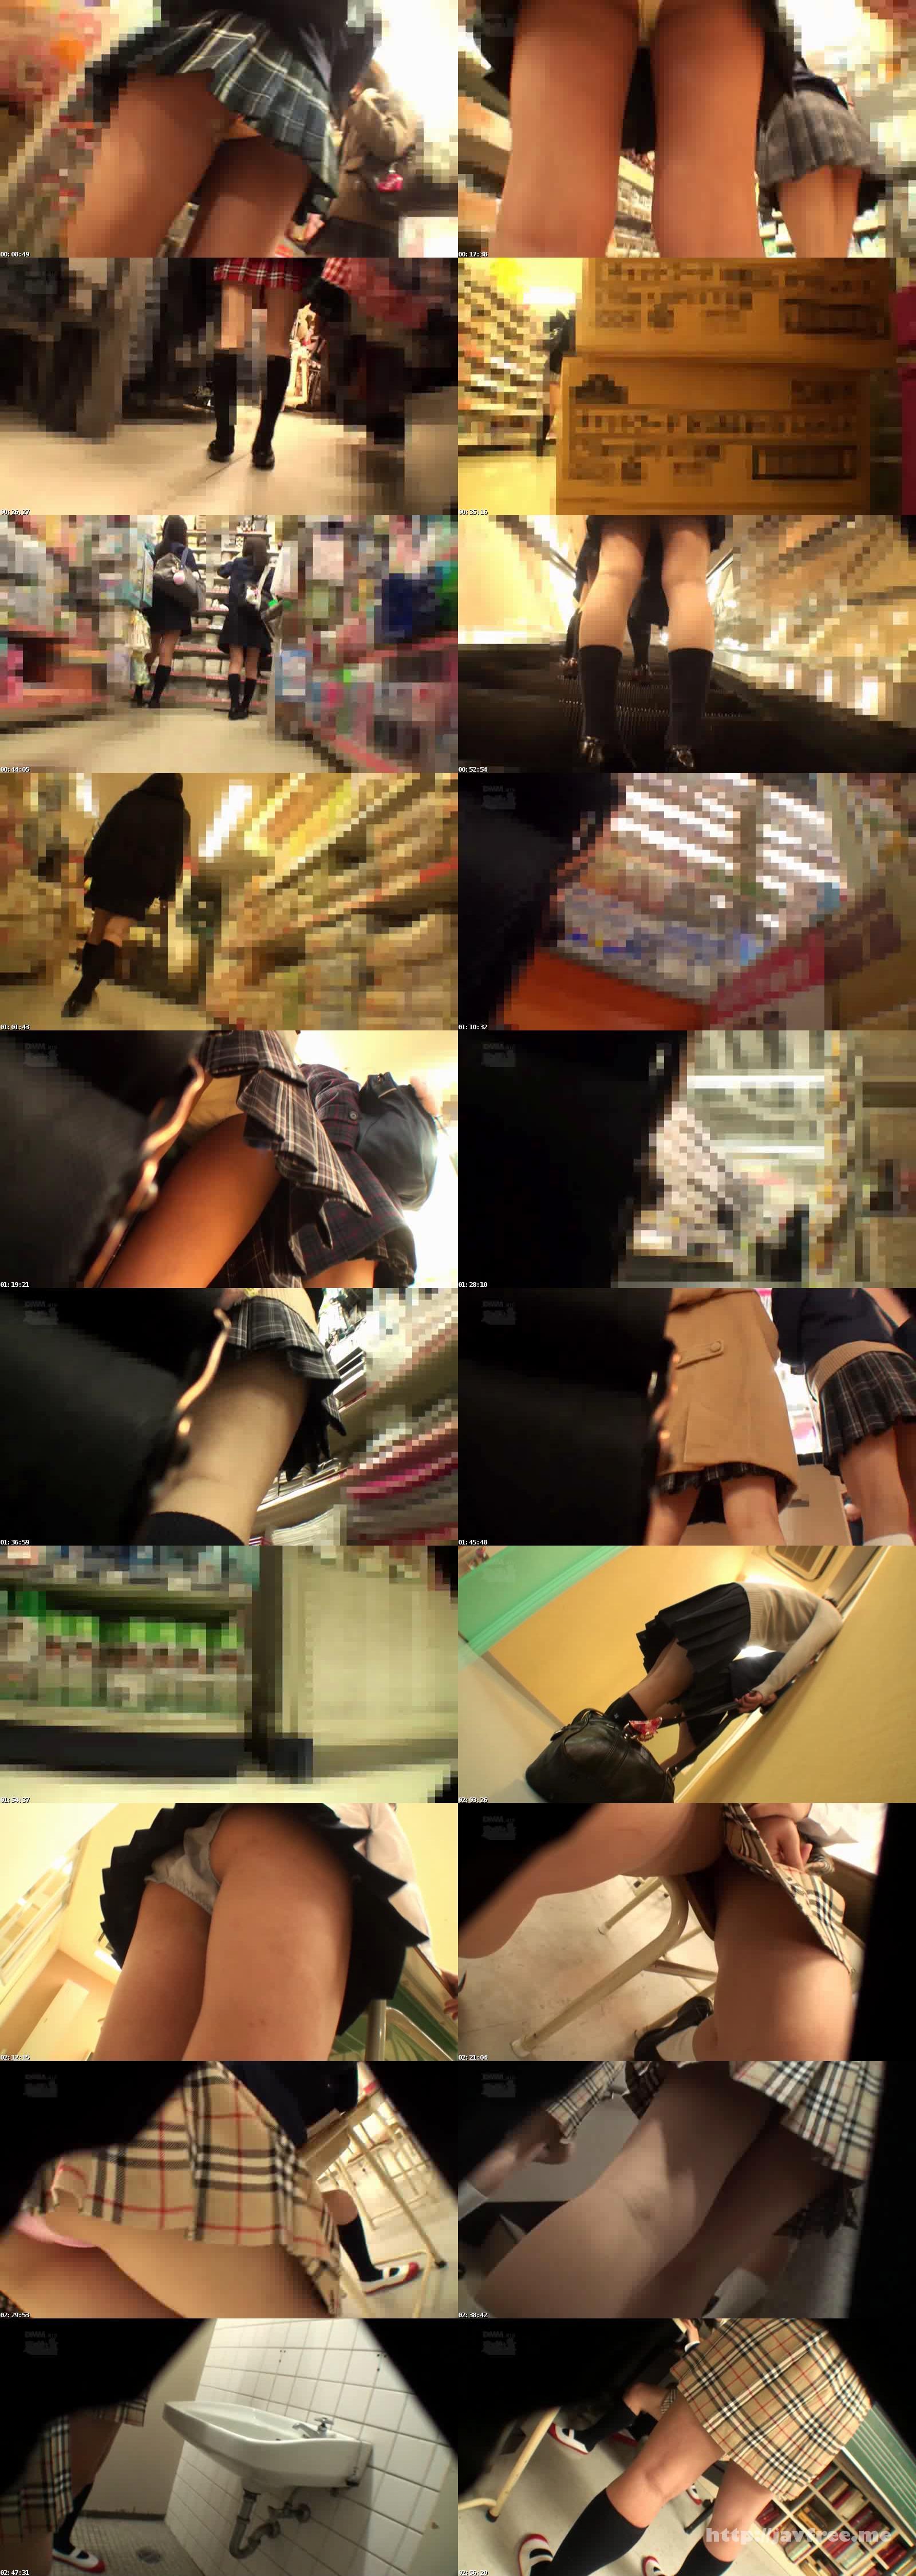 [CLUB 171] 1920×1080 Full HD Premium街エロ盗撮東京パンチラ捜査線 Blu ray (ブルーレイディスク) CLUB